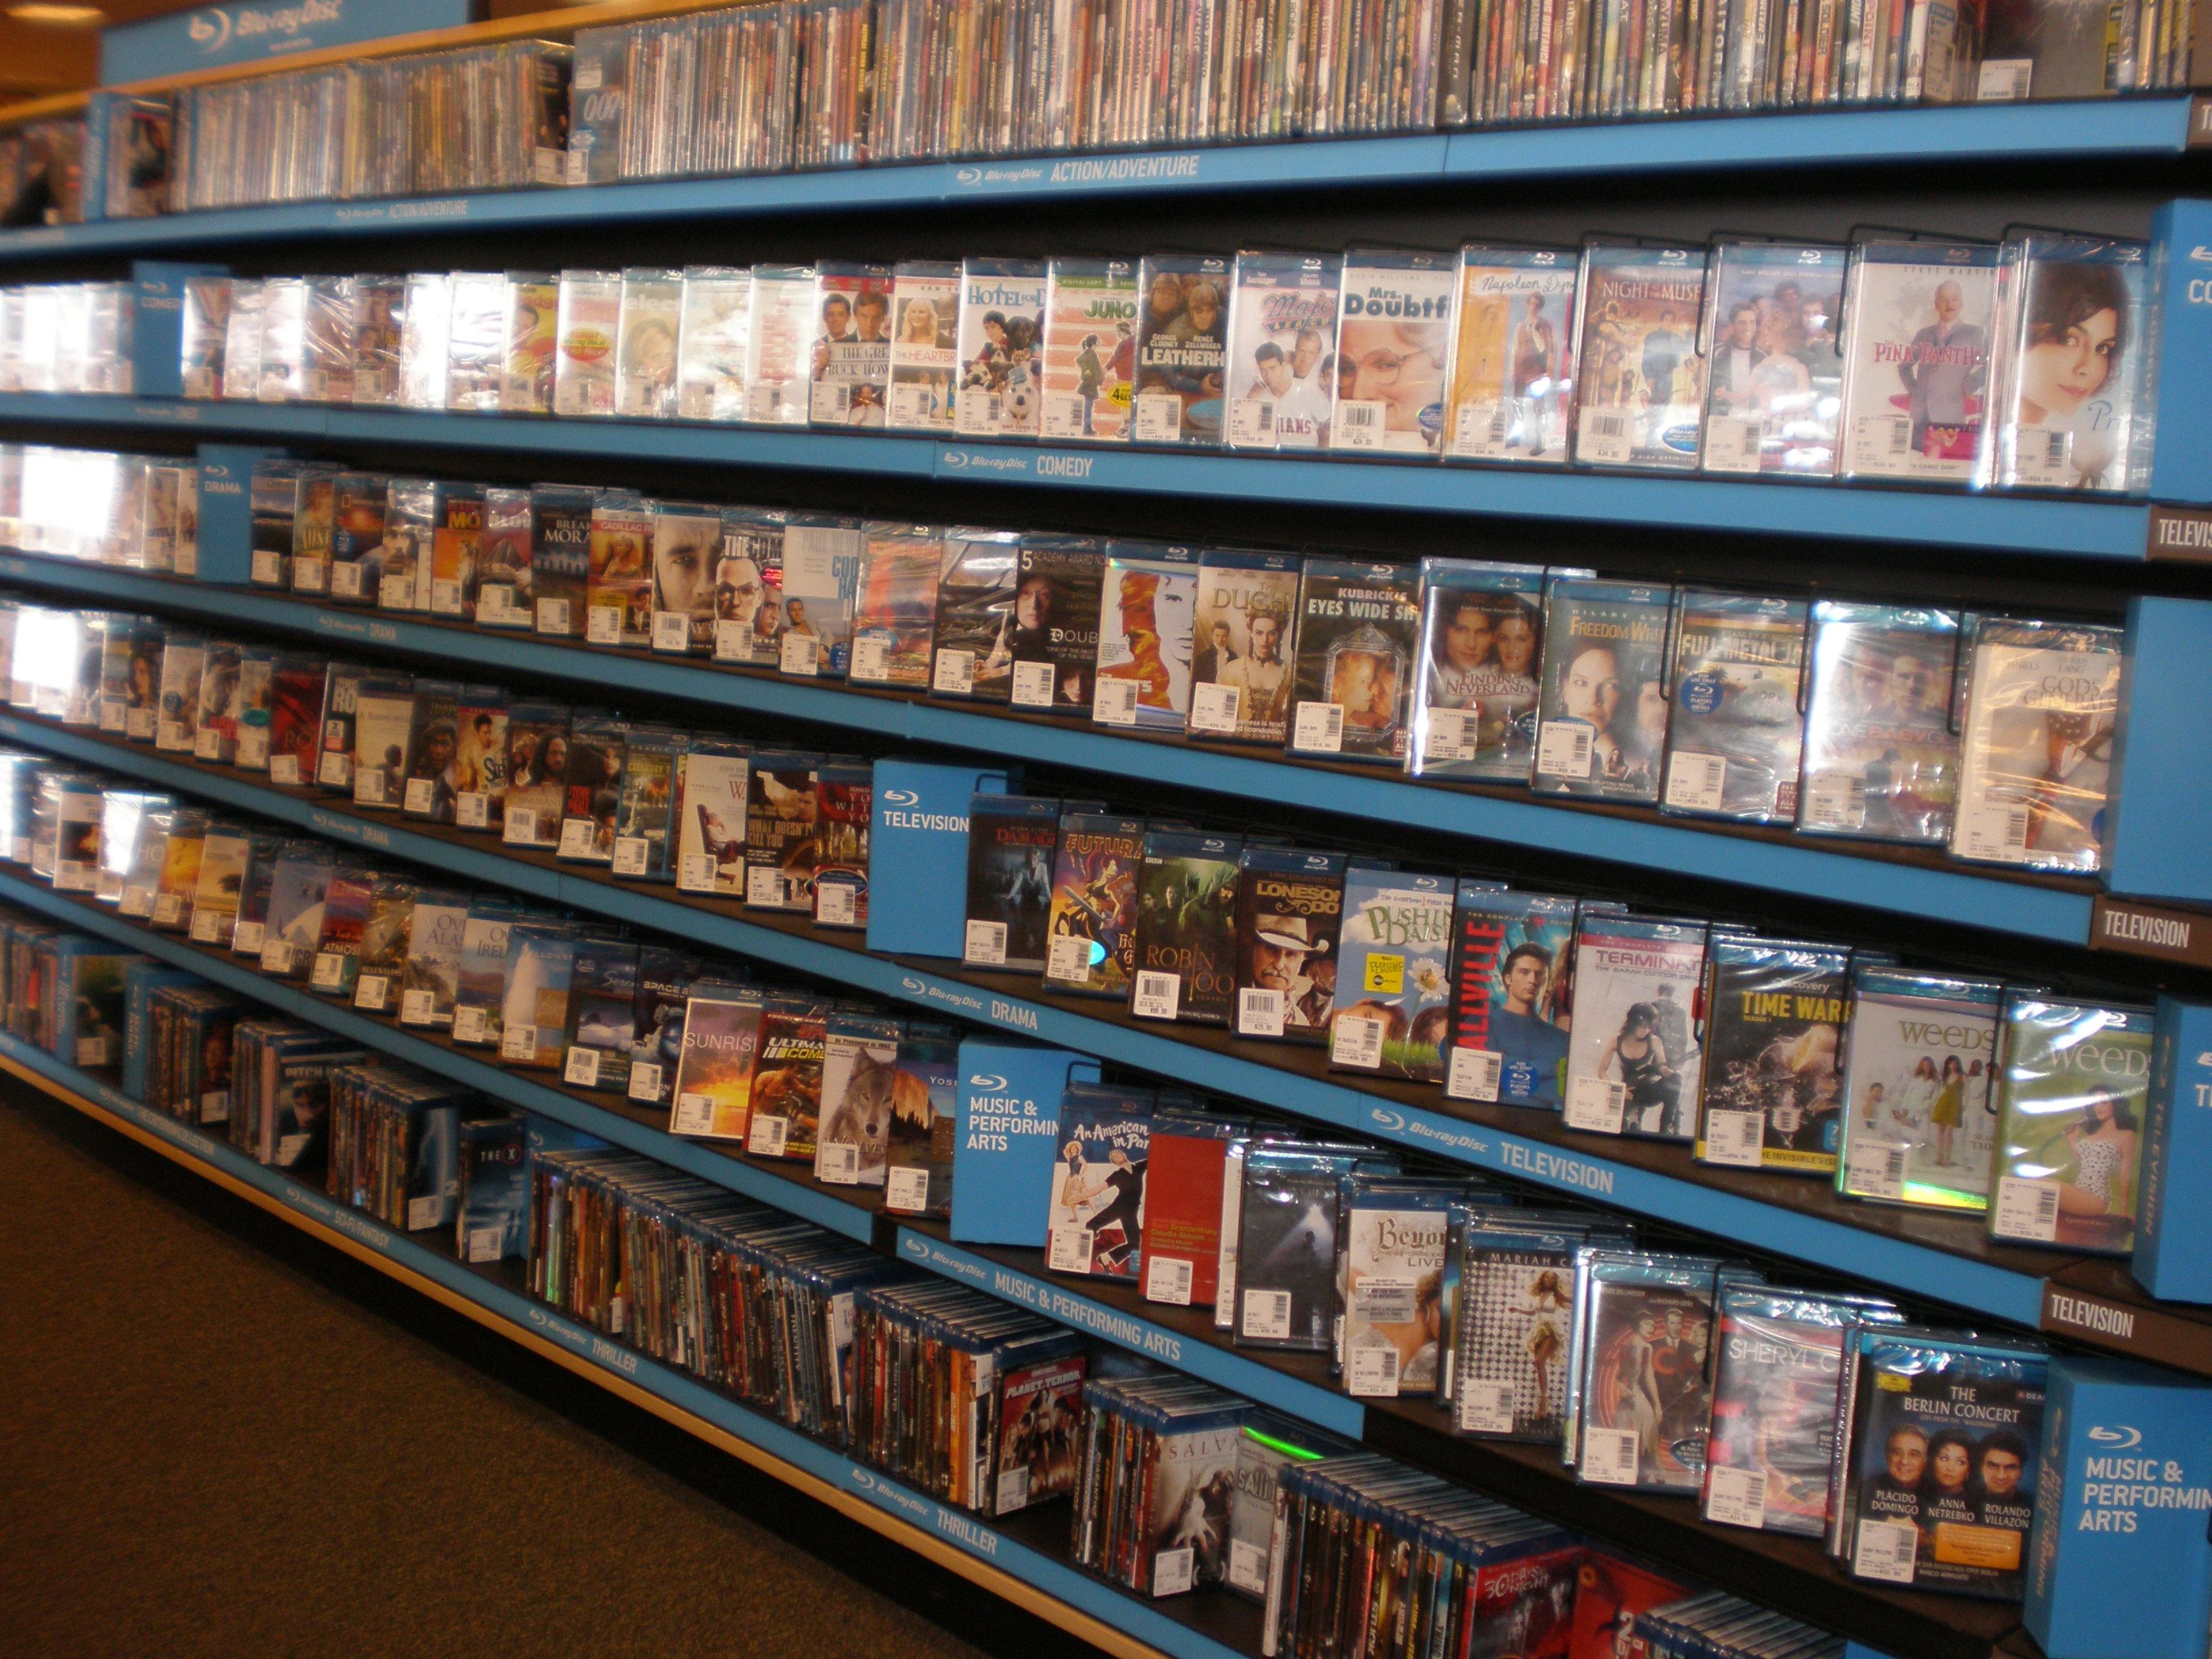 File:Blu-rays at Barnes & Noble, Tanforan.JPG - Wikimedia Commons